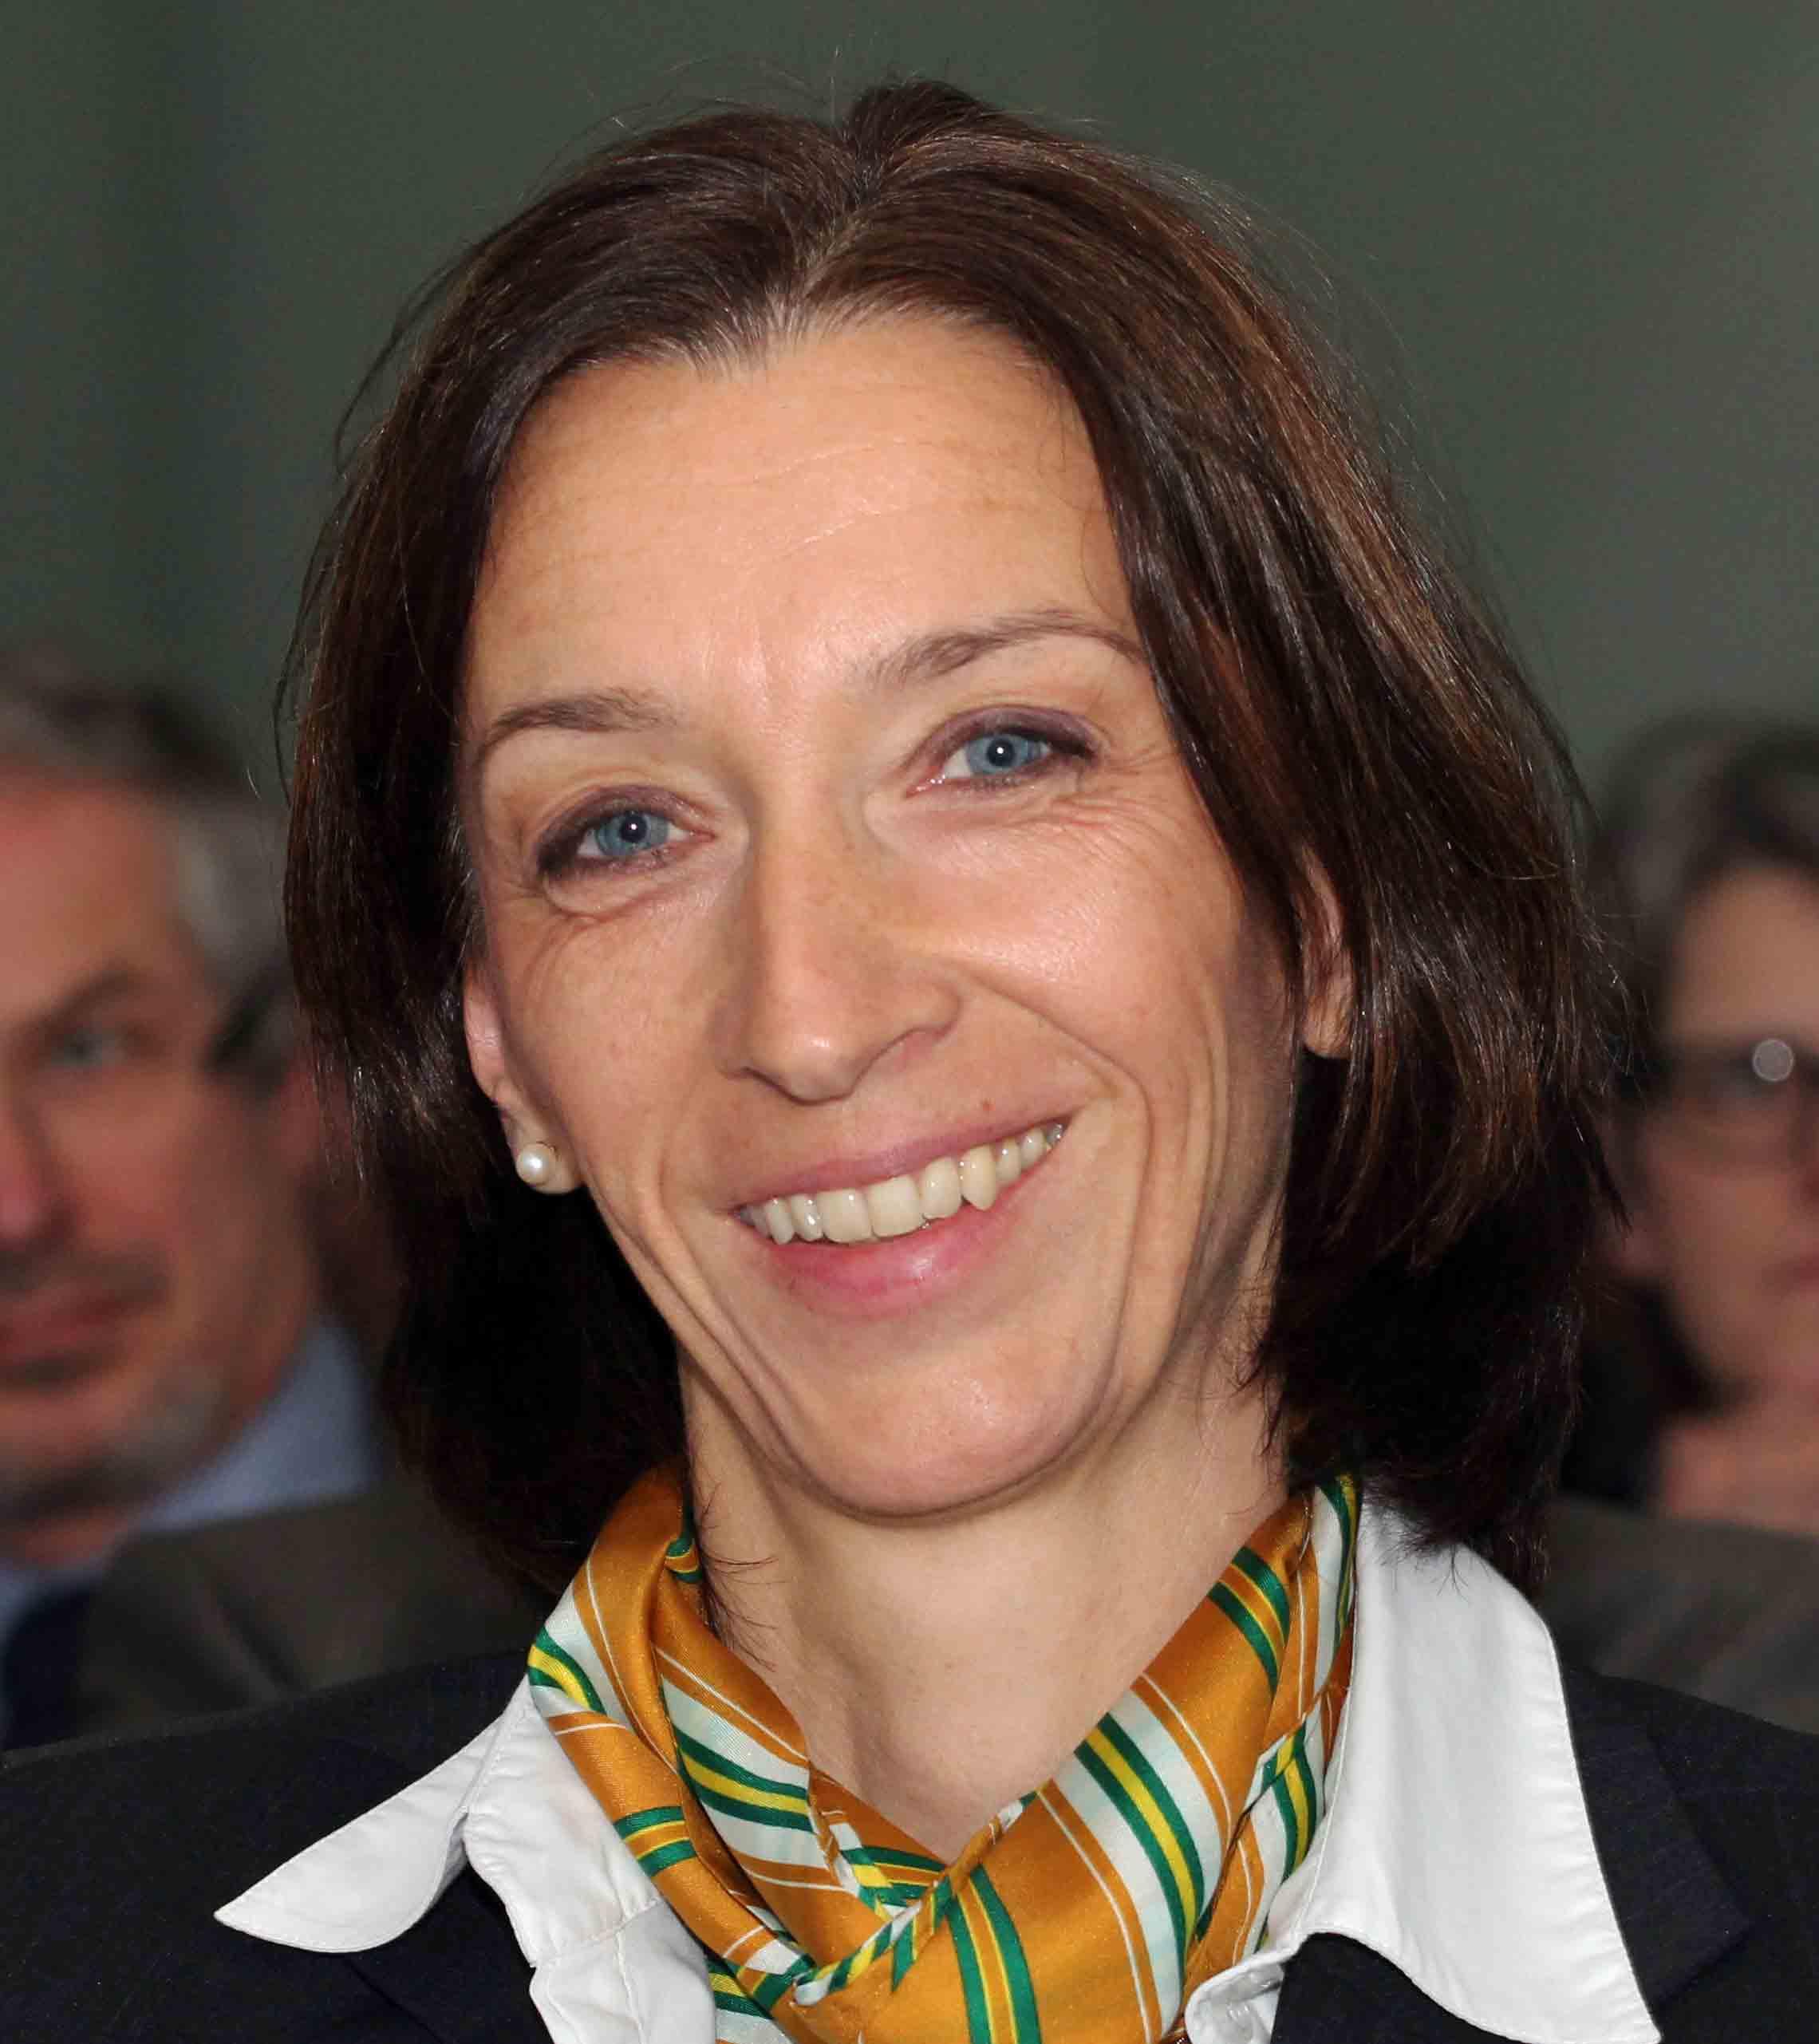 Meike Packeiser